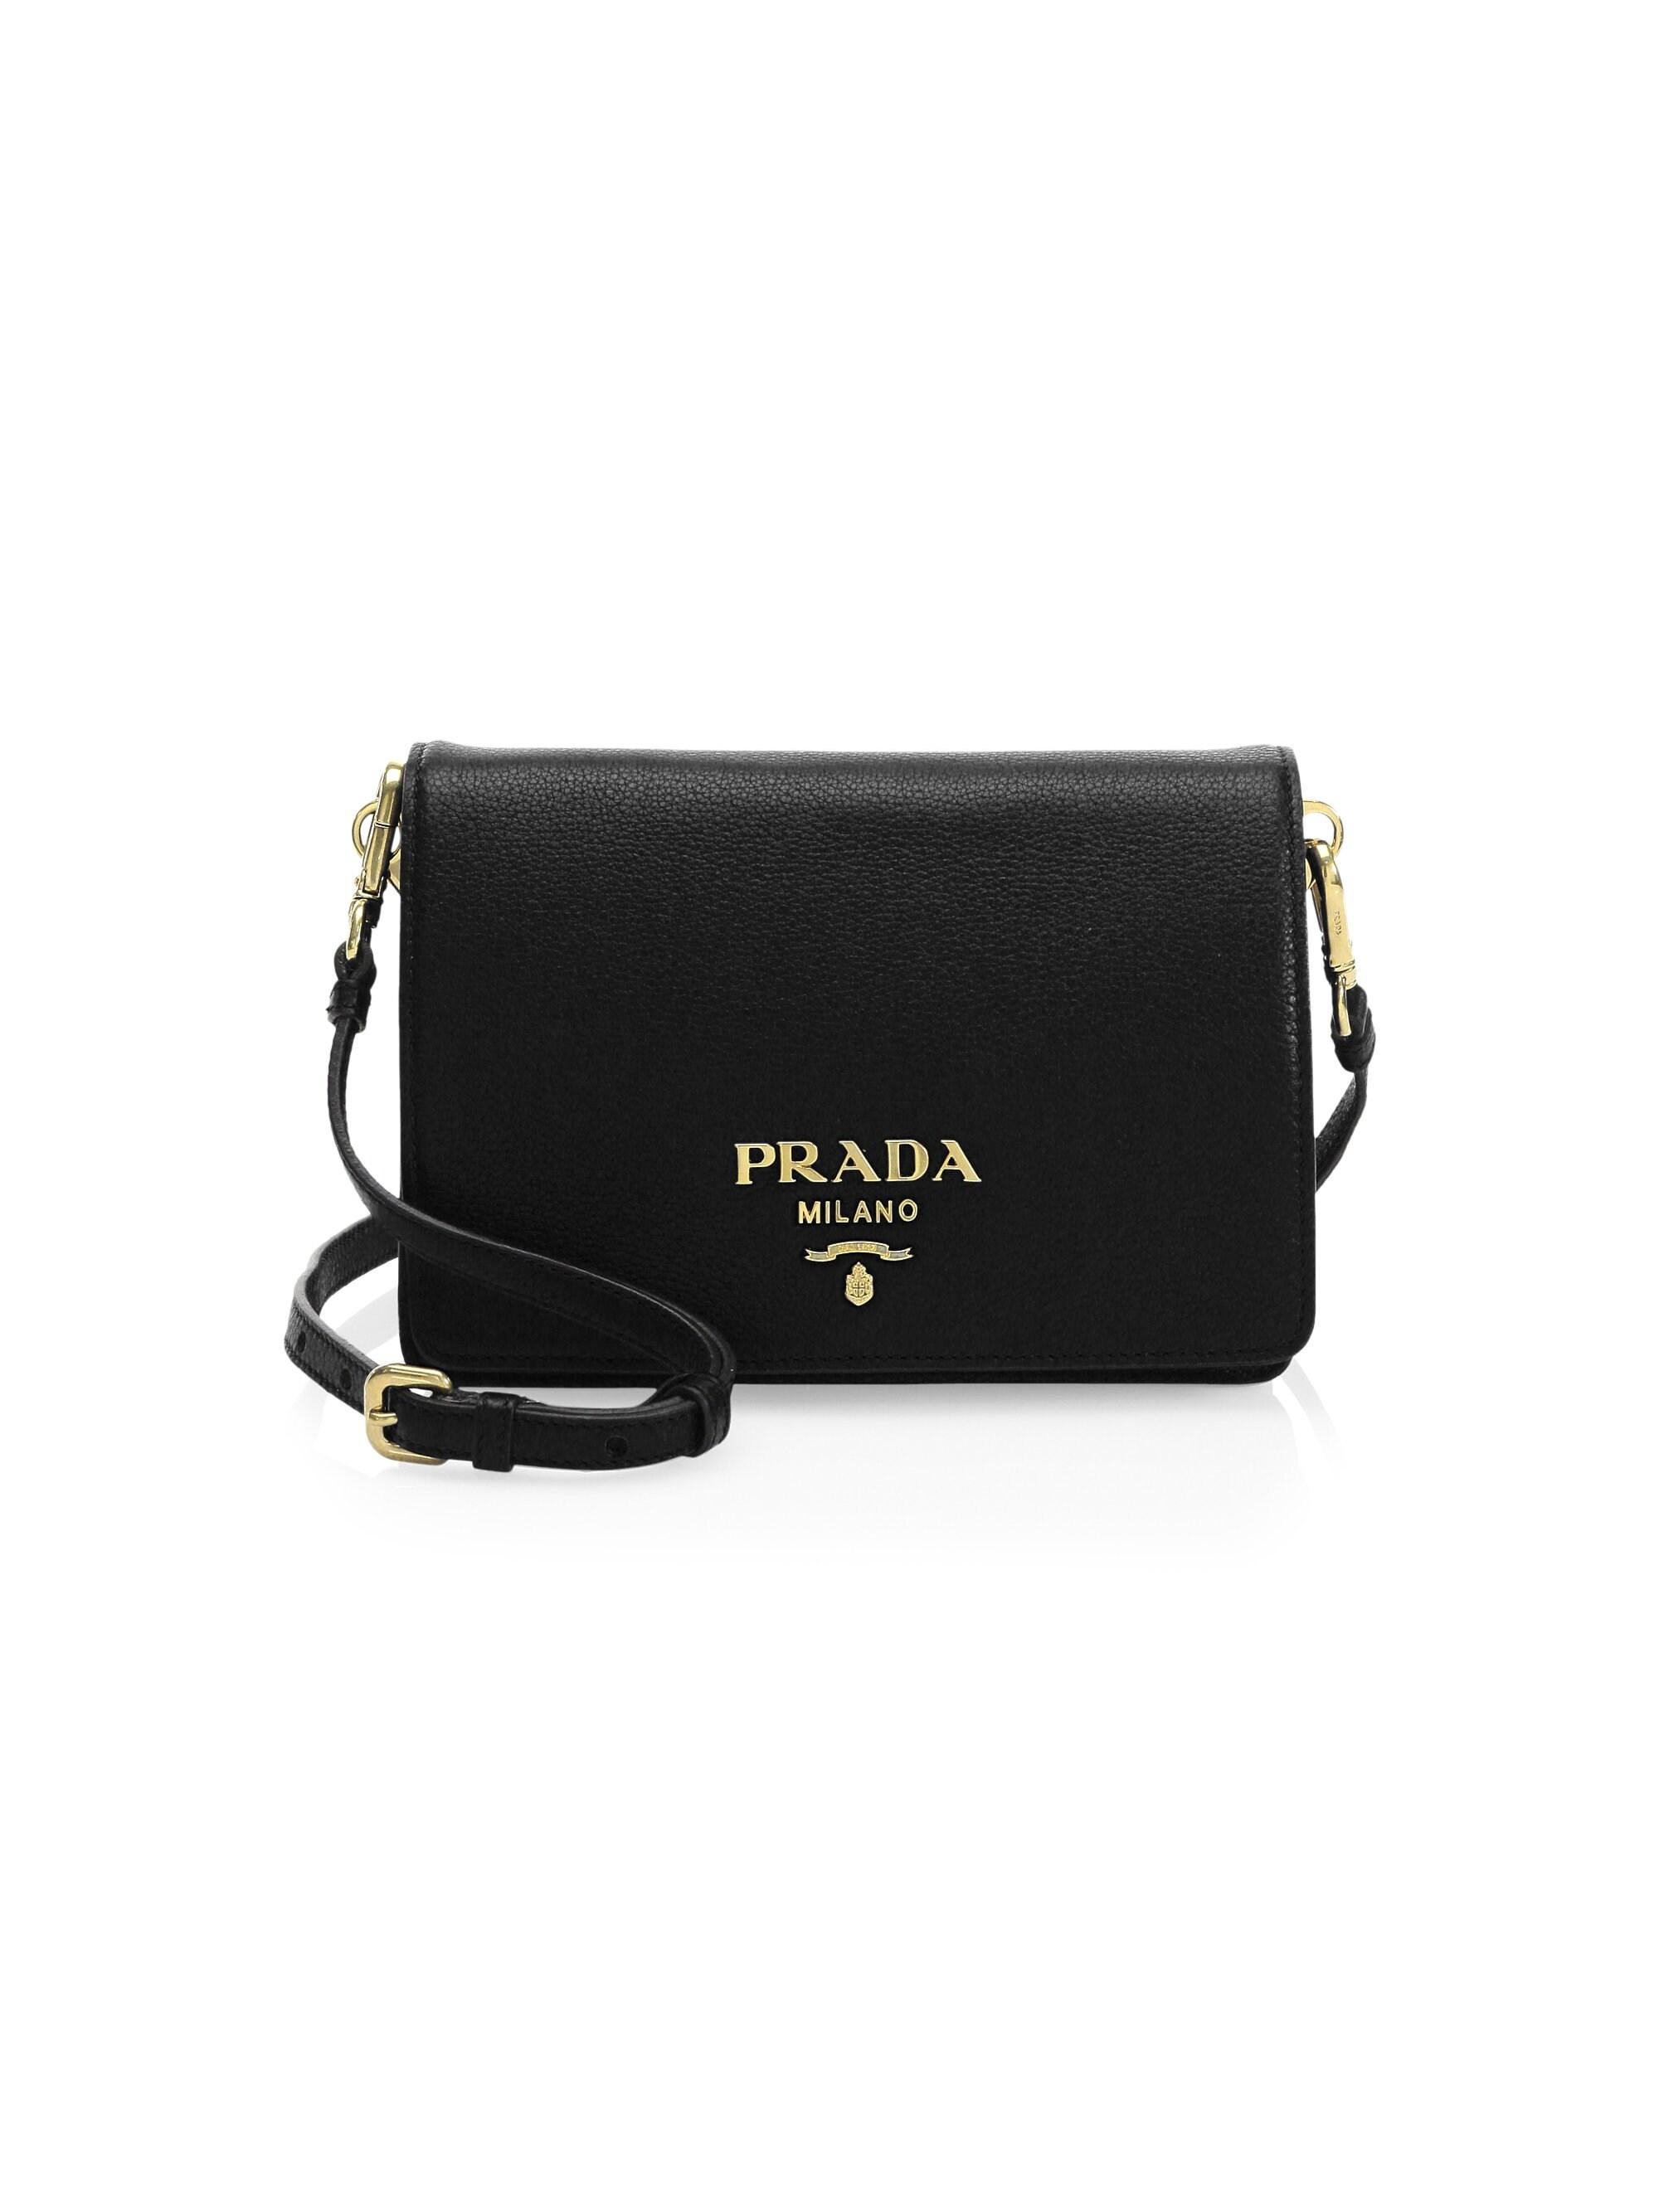 c3193e203603 Prada Small Daino Leather Shoulder Bag in Black - Lyst